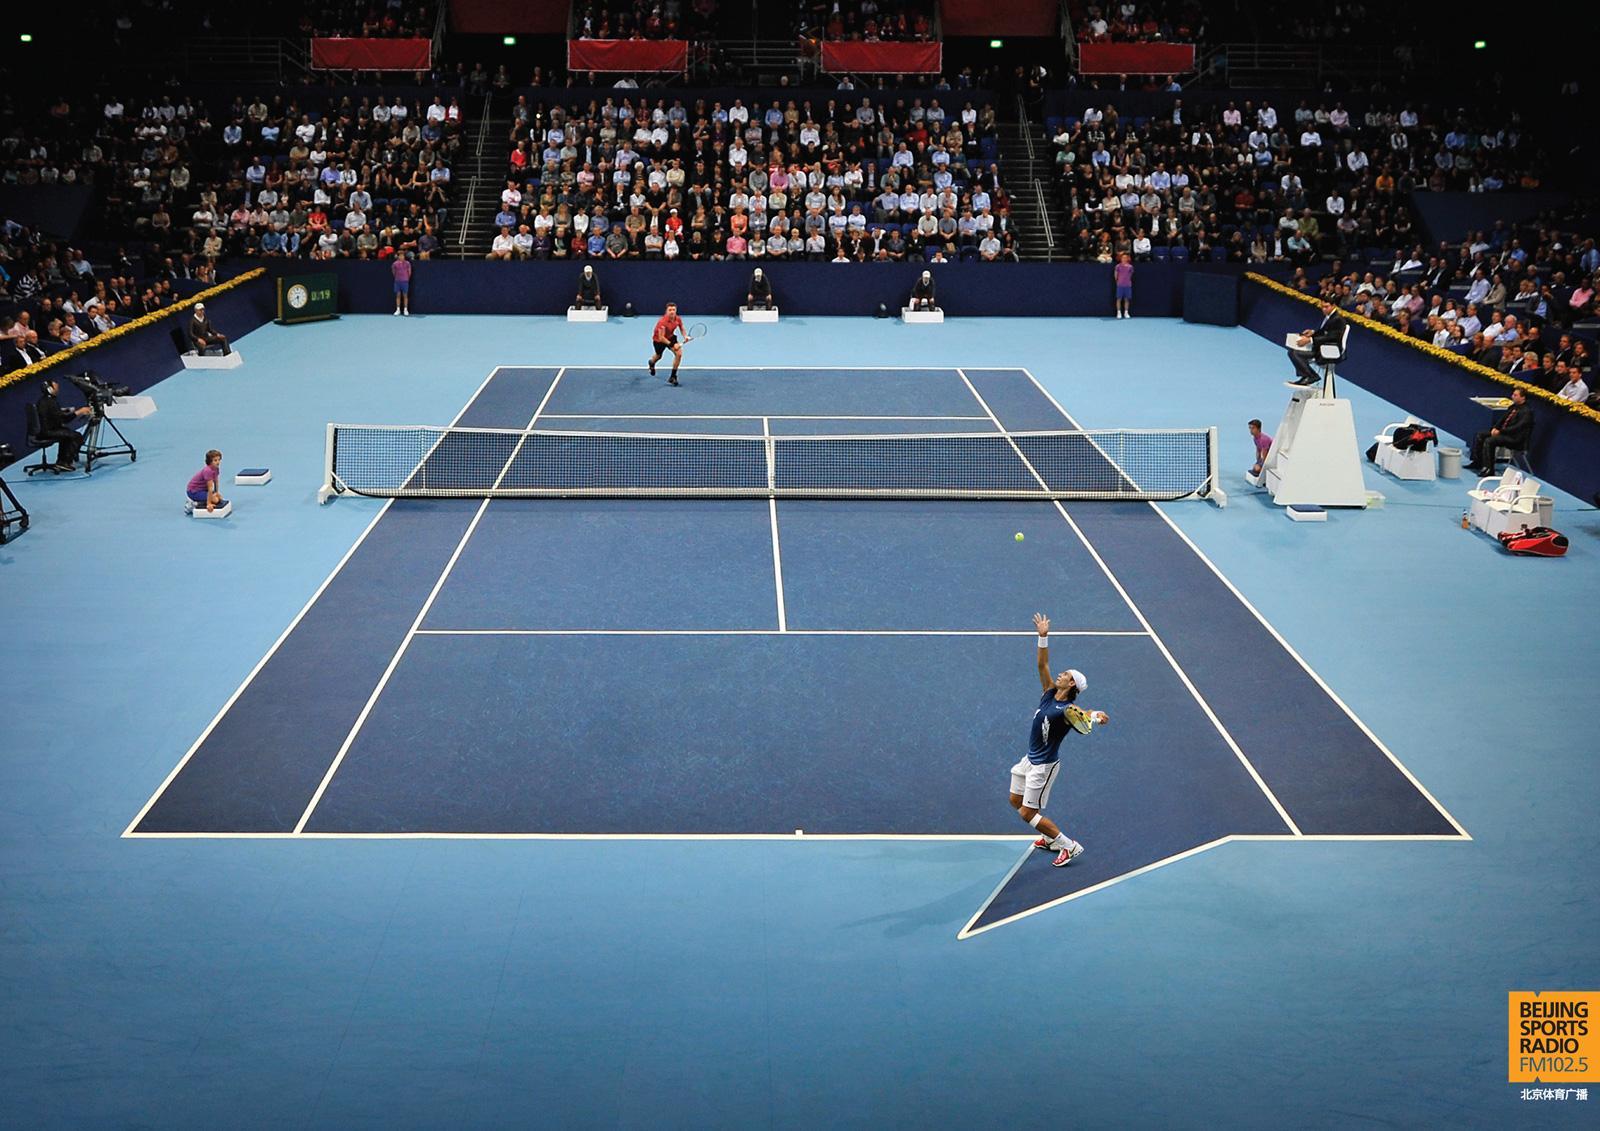 Beijing Sports Radio Print Ad -  Tennis